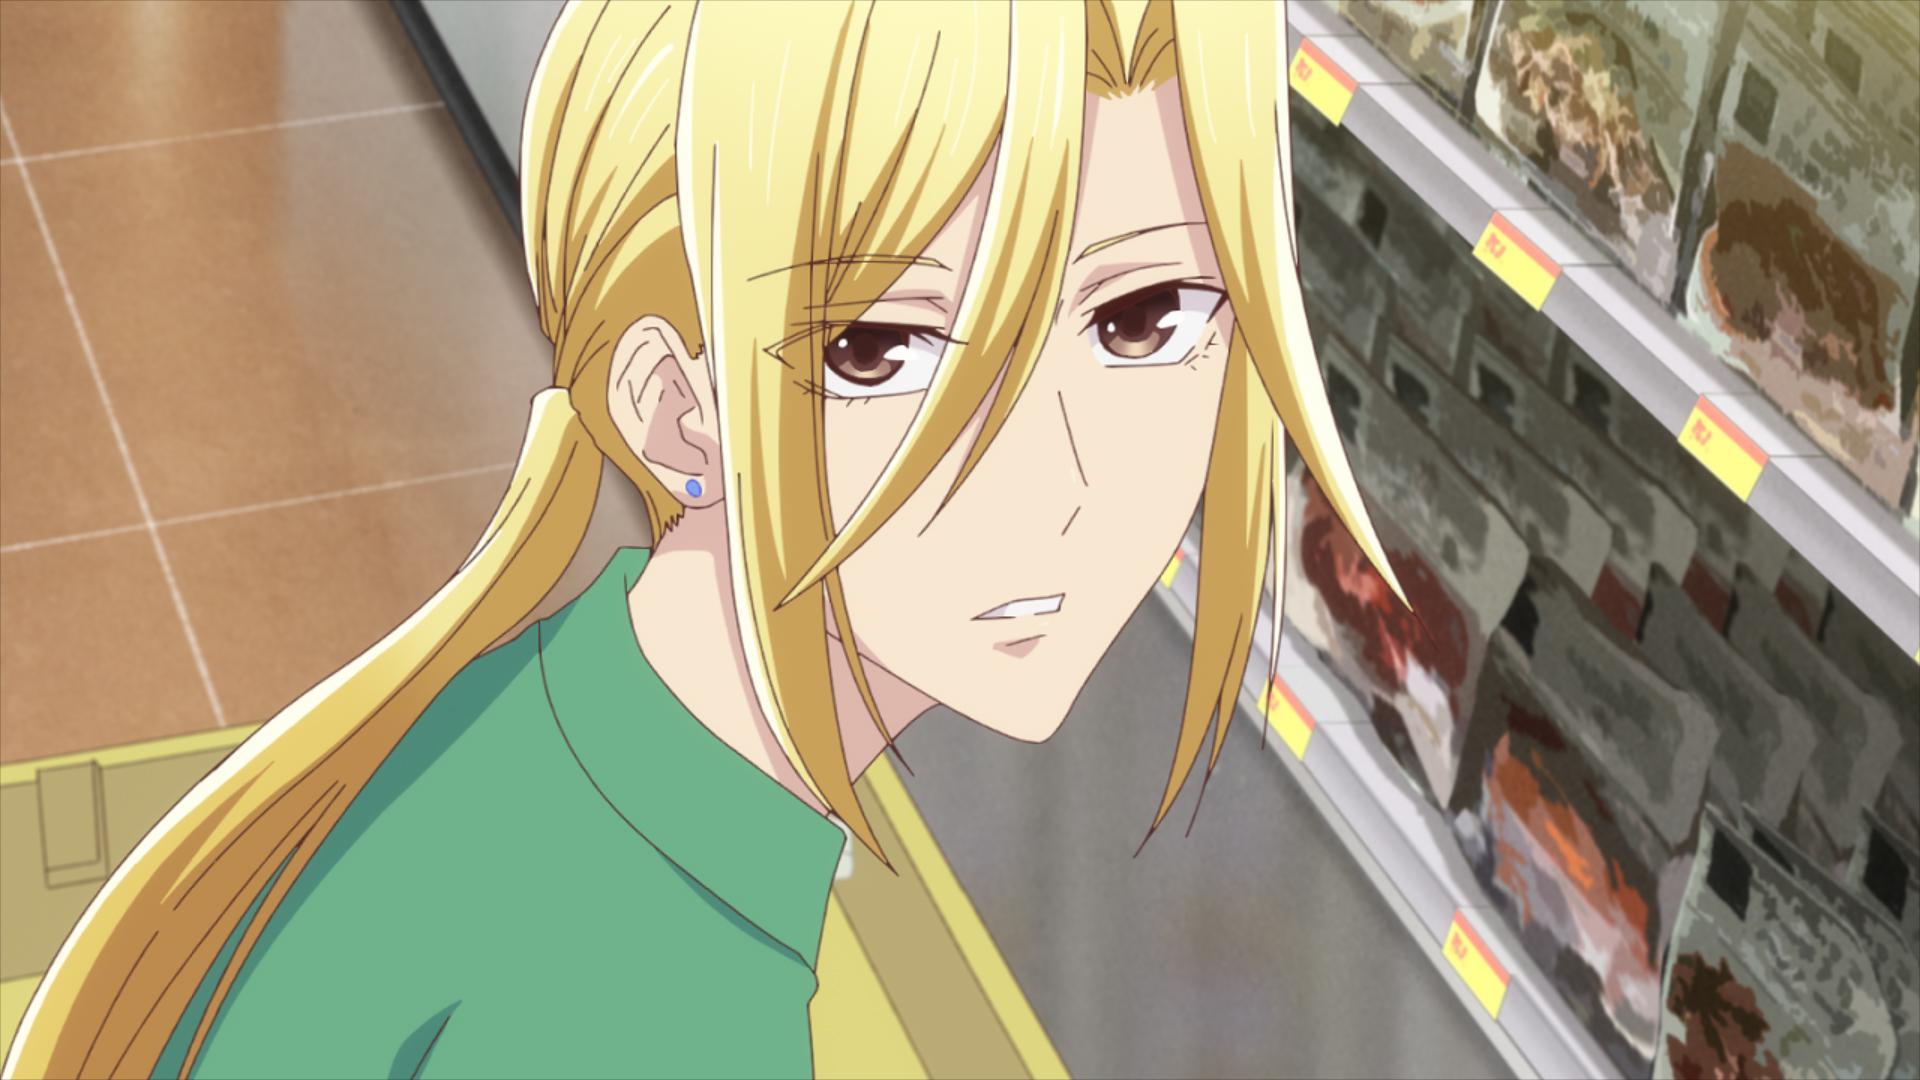 Watch Fruits Basket Season 2 Episode 5 Sub & Dub | Anime Simulcast ...